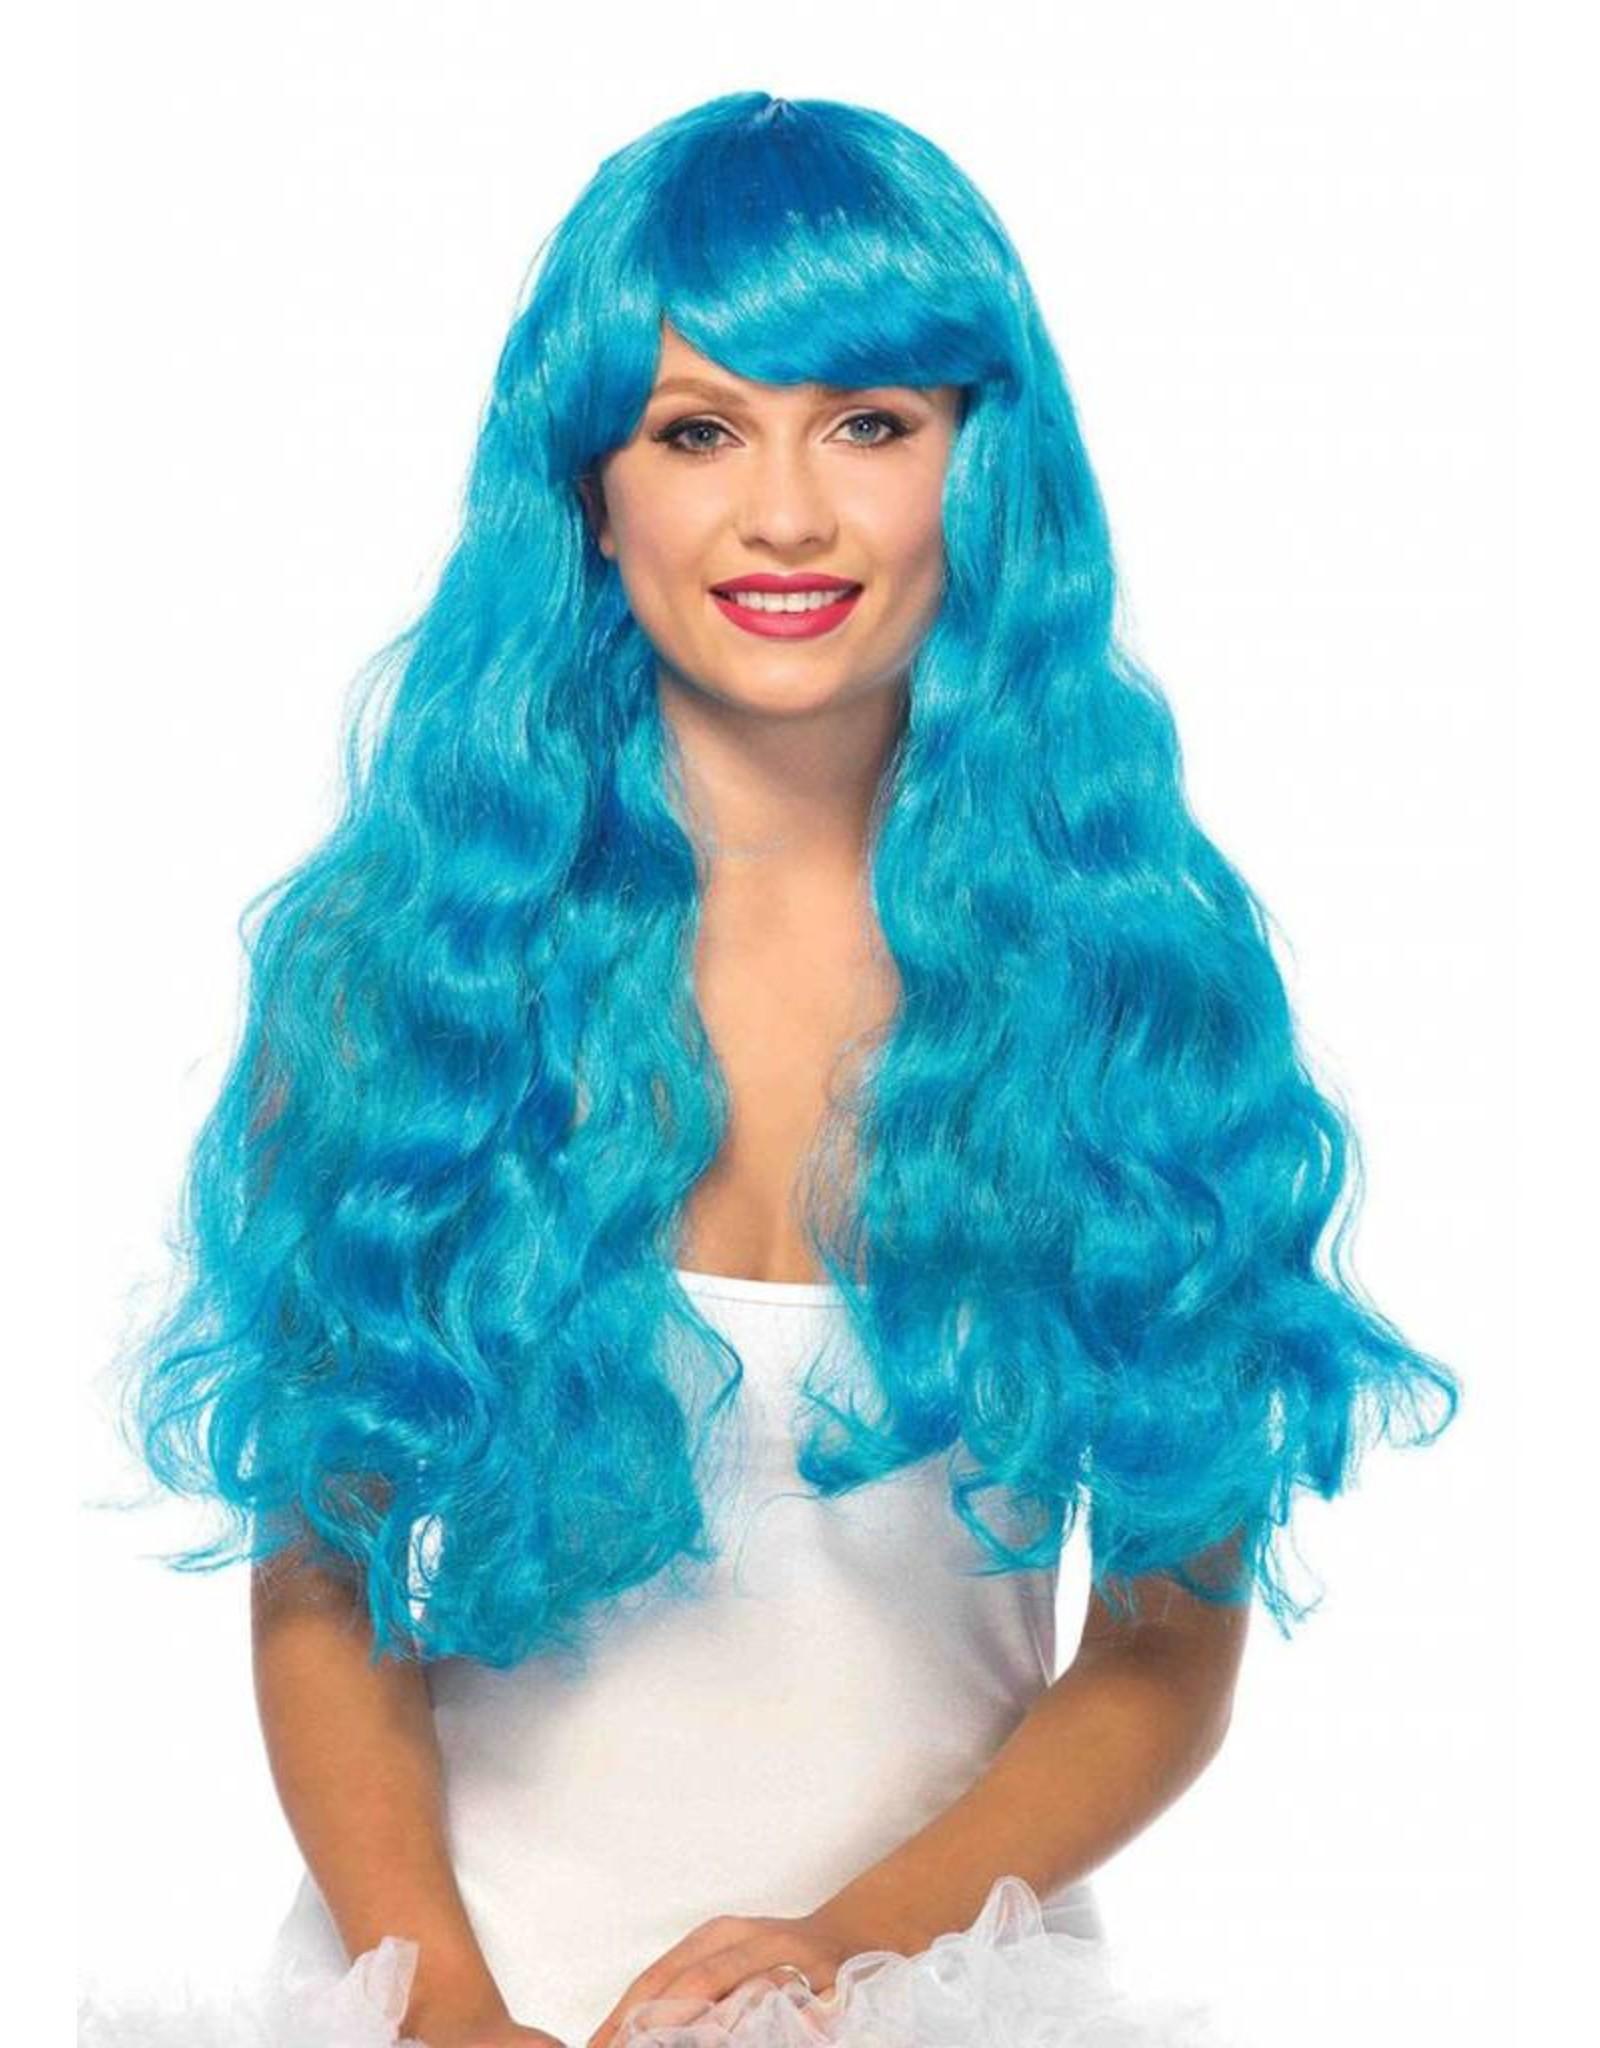 Leg Avenue Star Neon Wig Blue